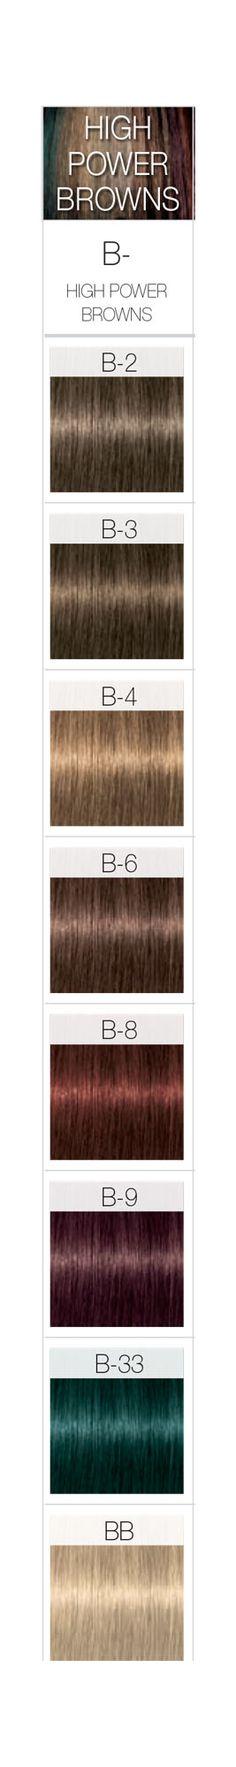 Elegant Igora Hair Color Chart